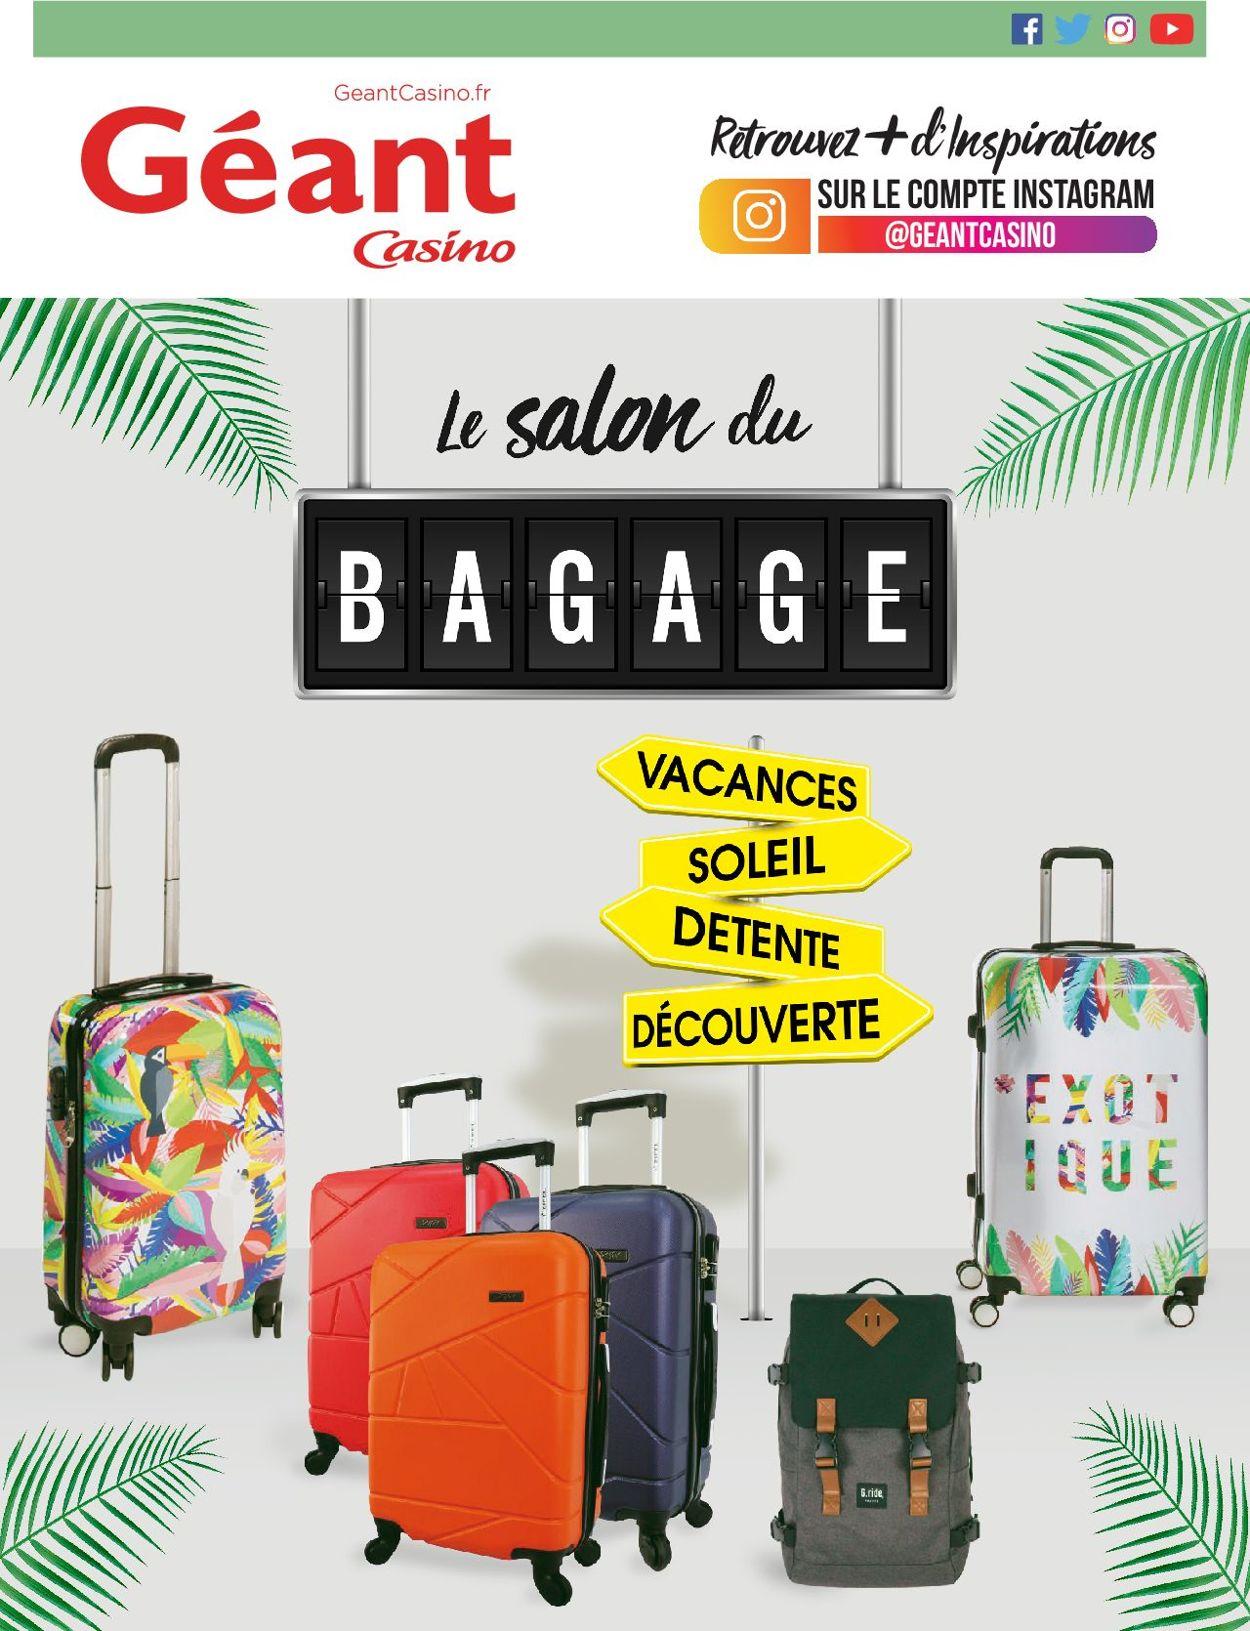 Géant Casino Catalogue - 14.05-26.05.2019